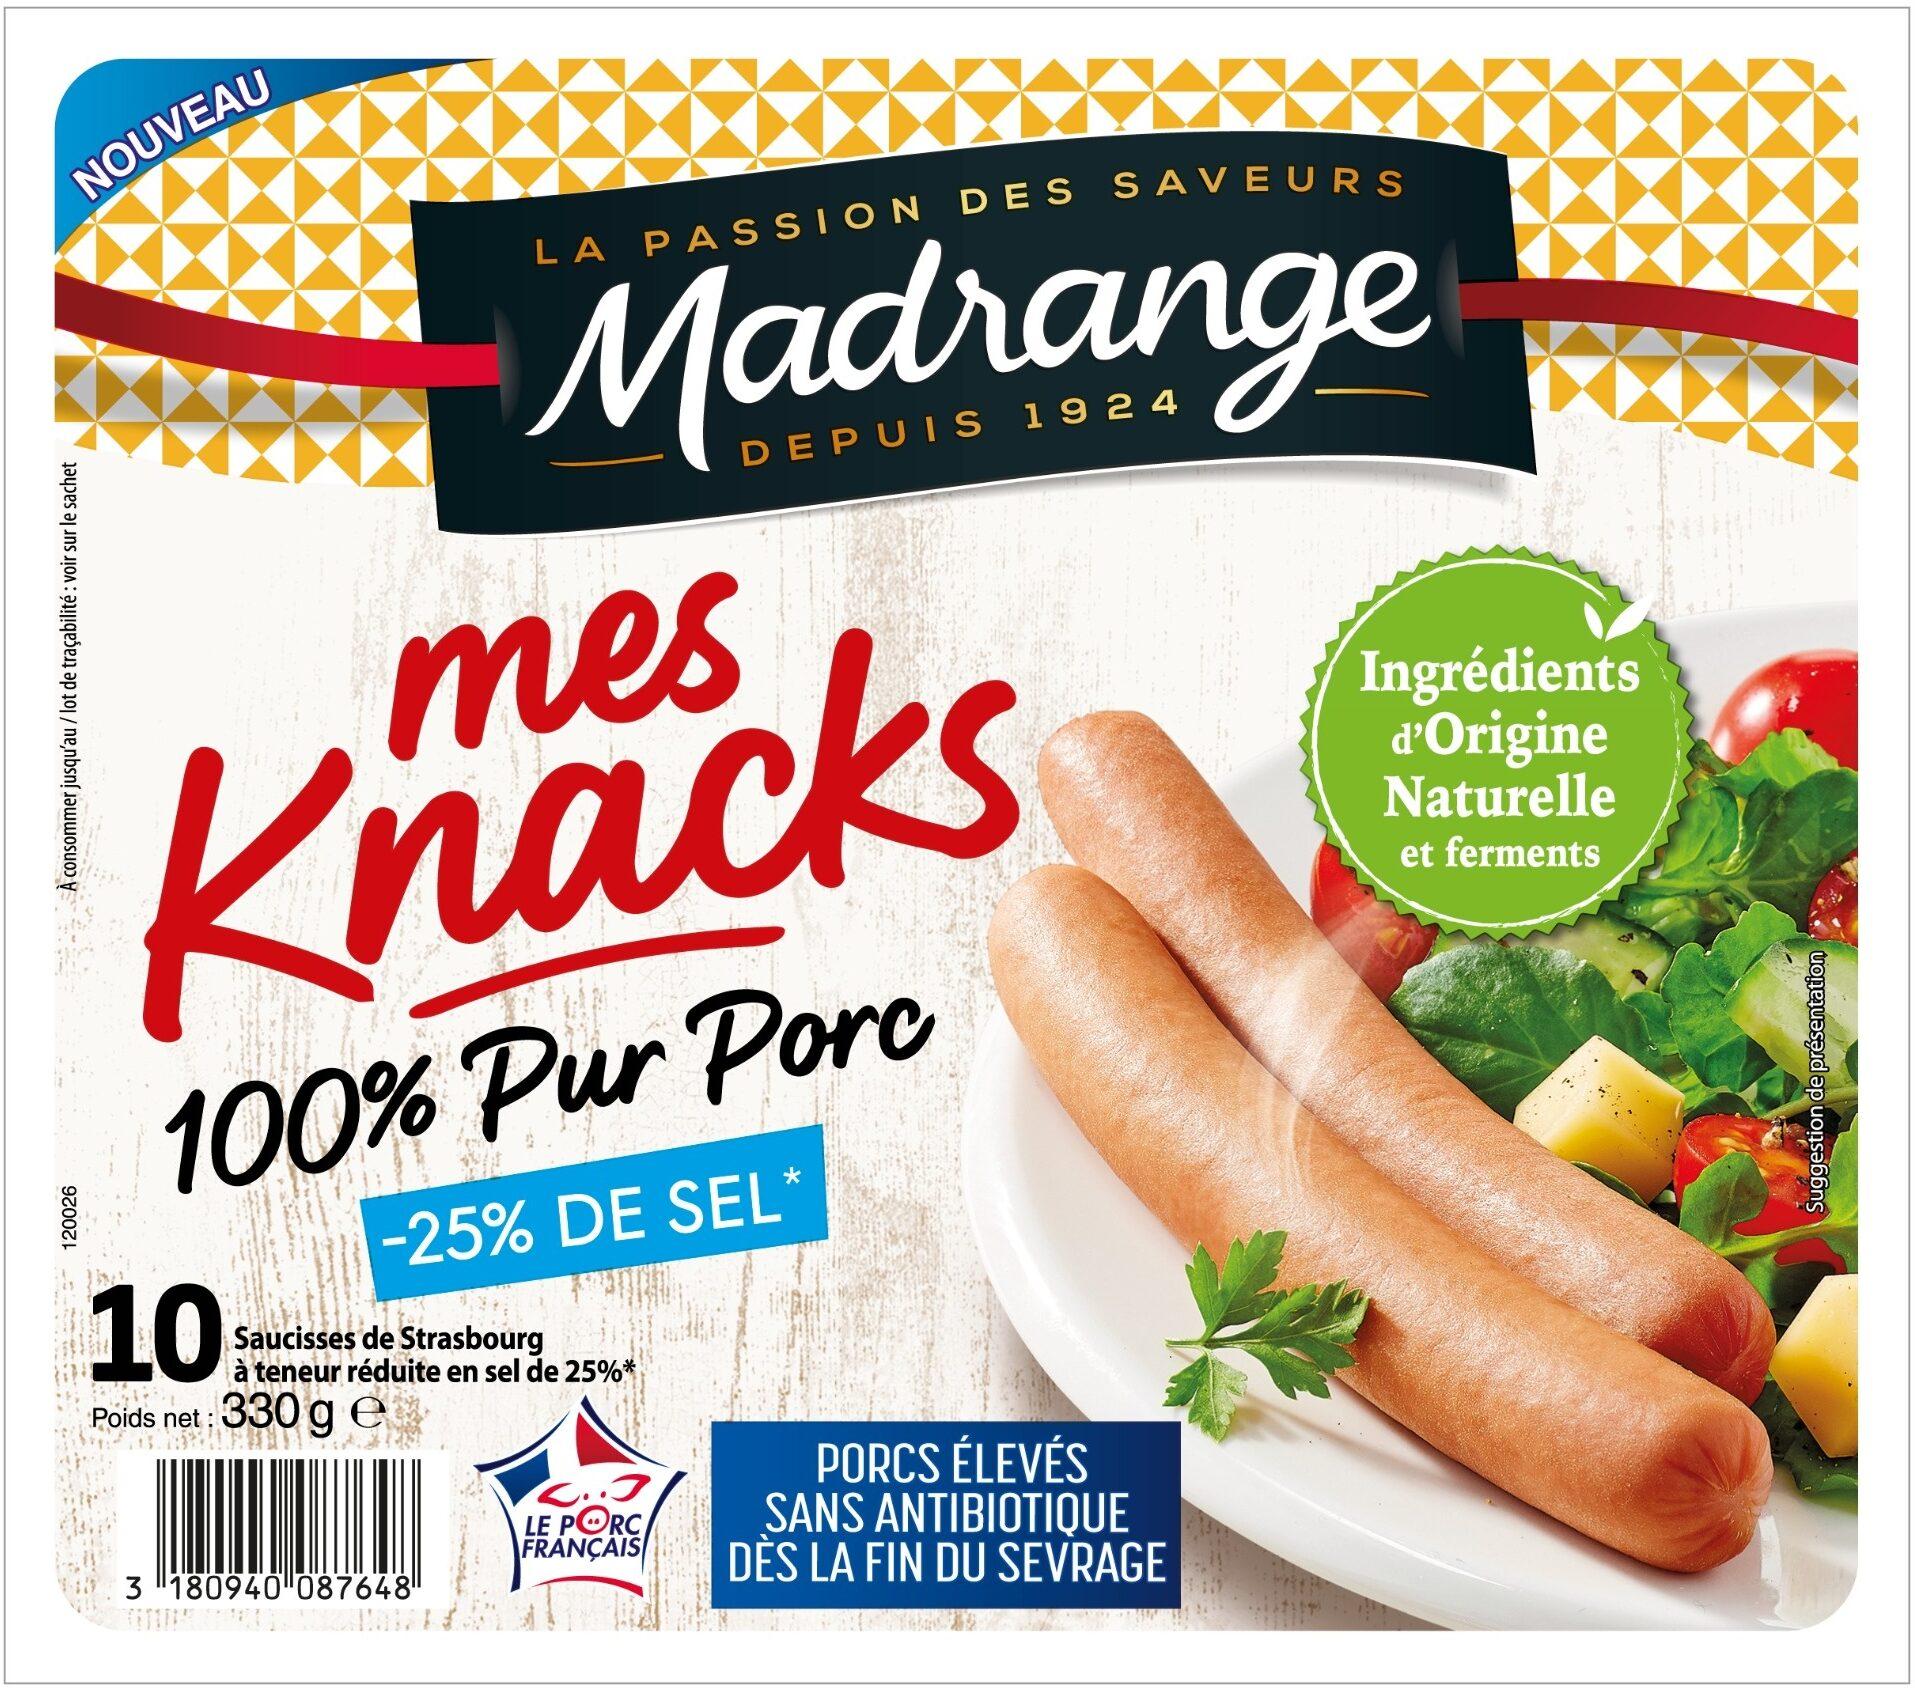 Mes Knacks 100% Pur Porc -25% DE SEL - Product - fr